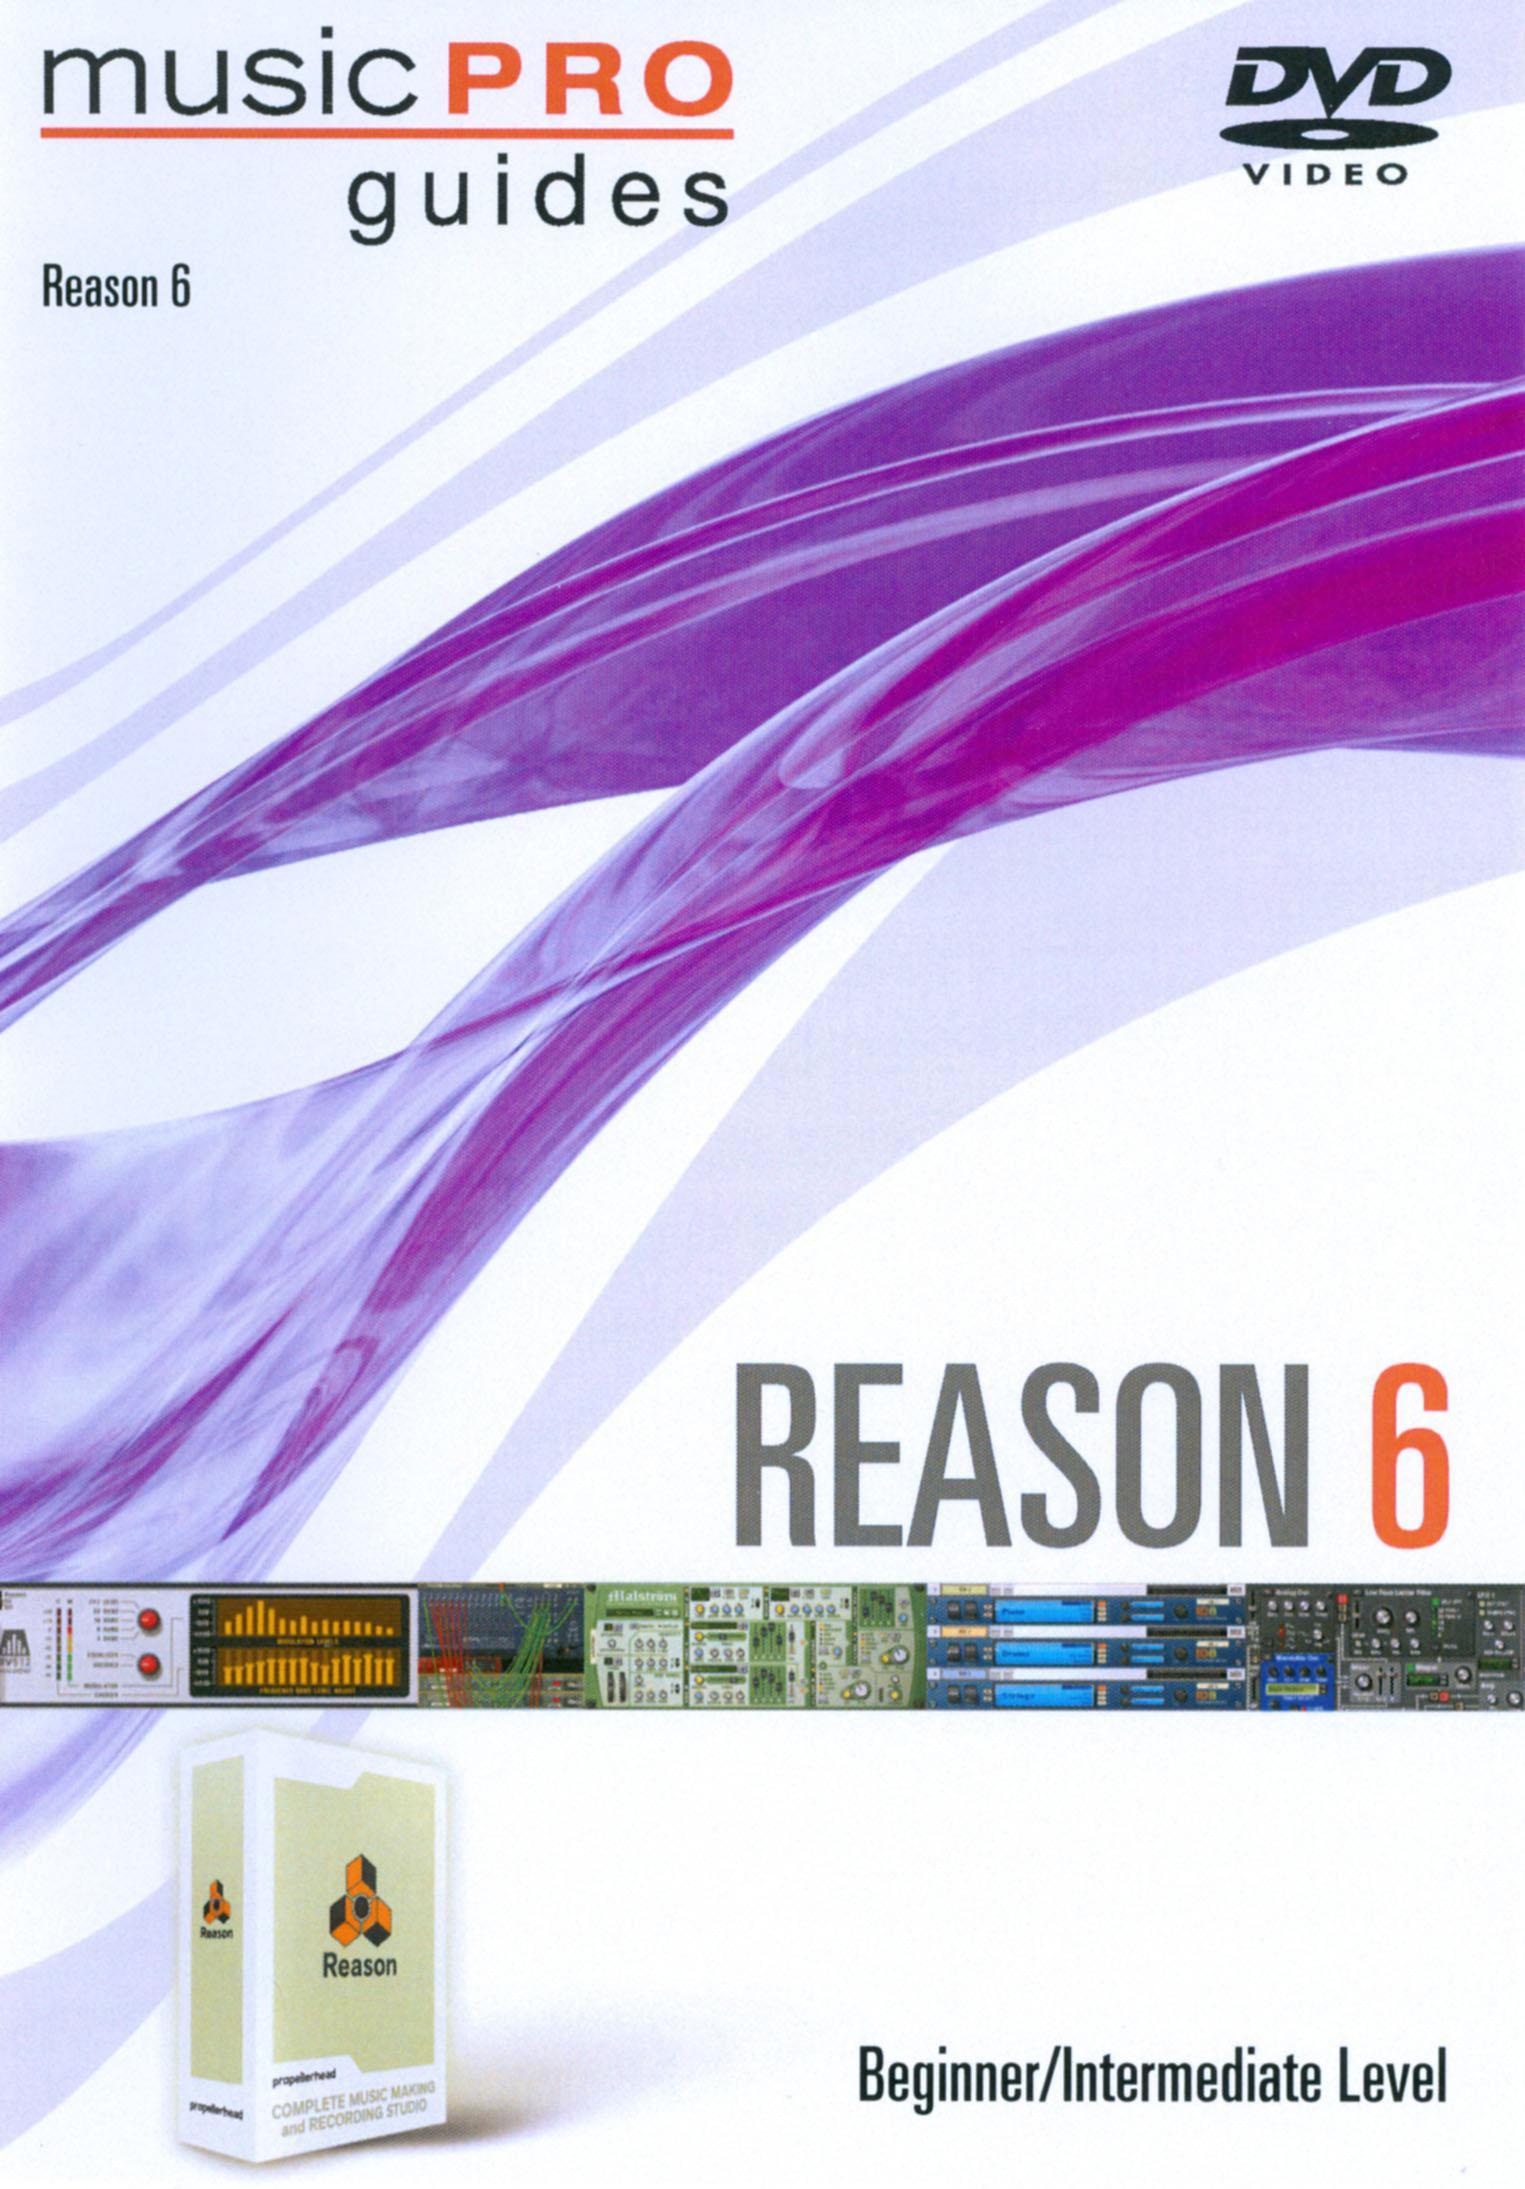 MusicPro Guides: Reason 6 - Beginner/Intermediate Level